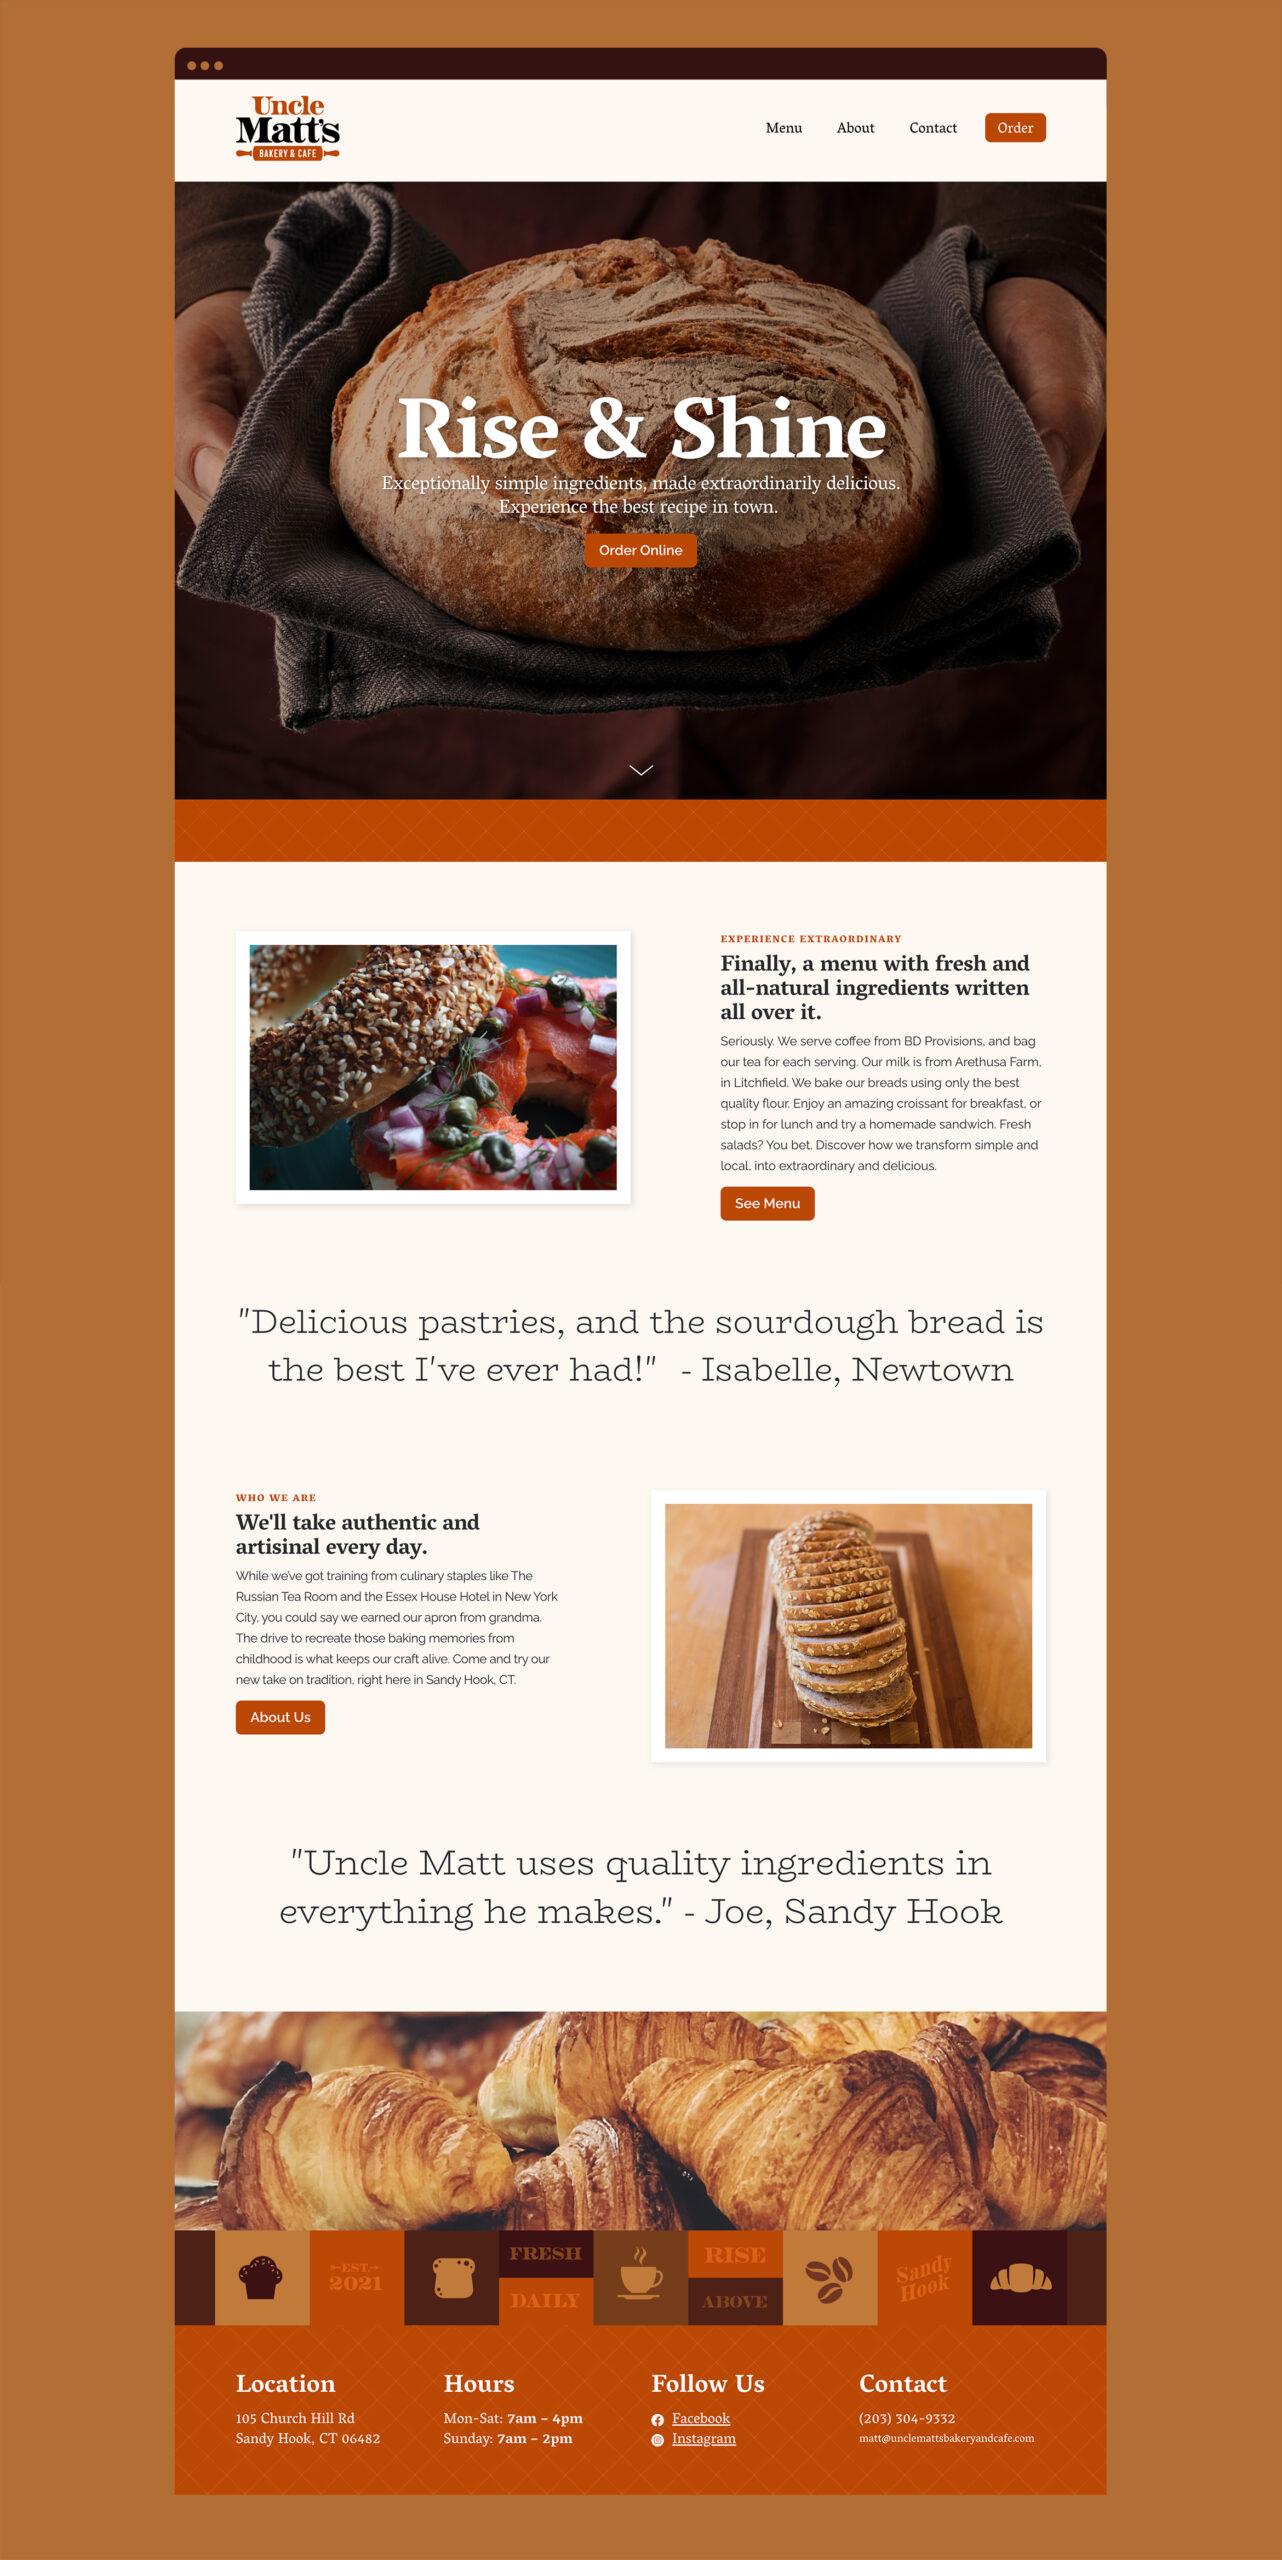 UncleMatts_Website